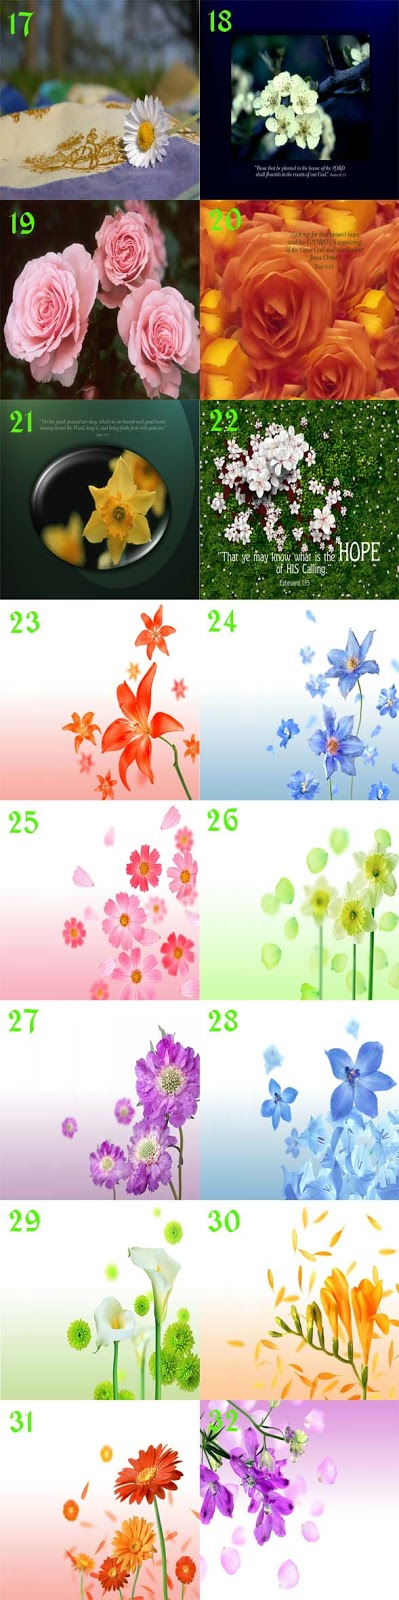 gambar cantik wallpaper bunga